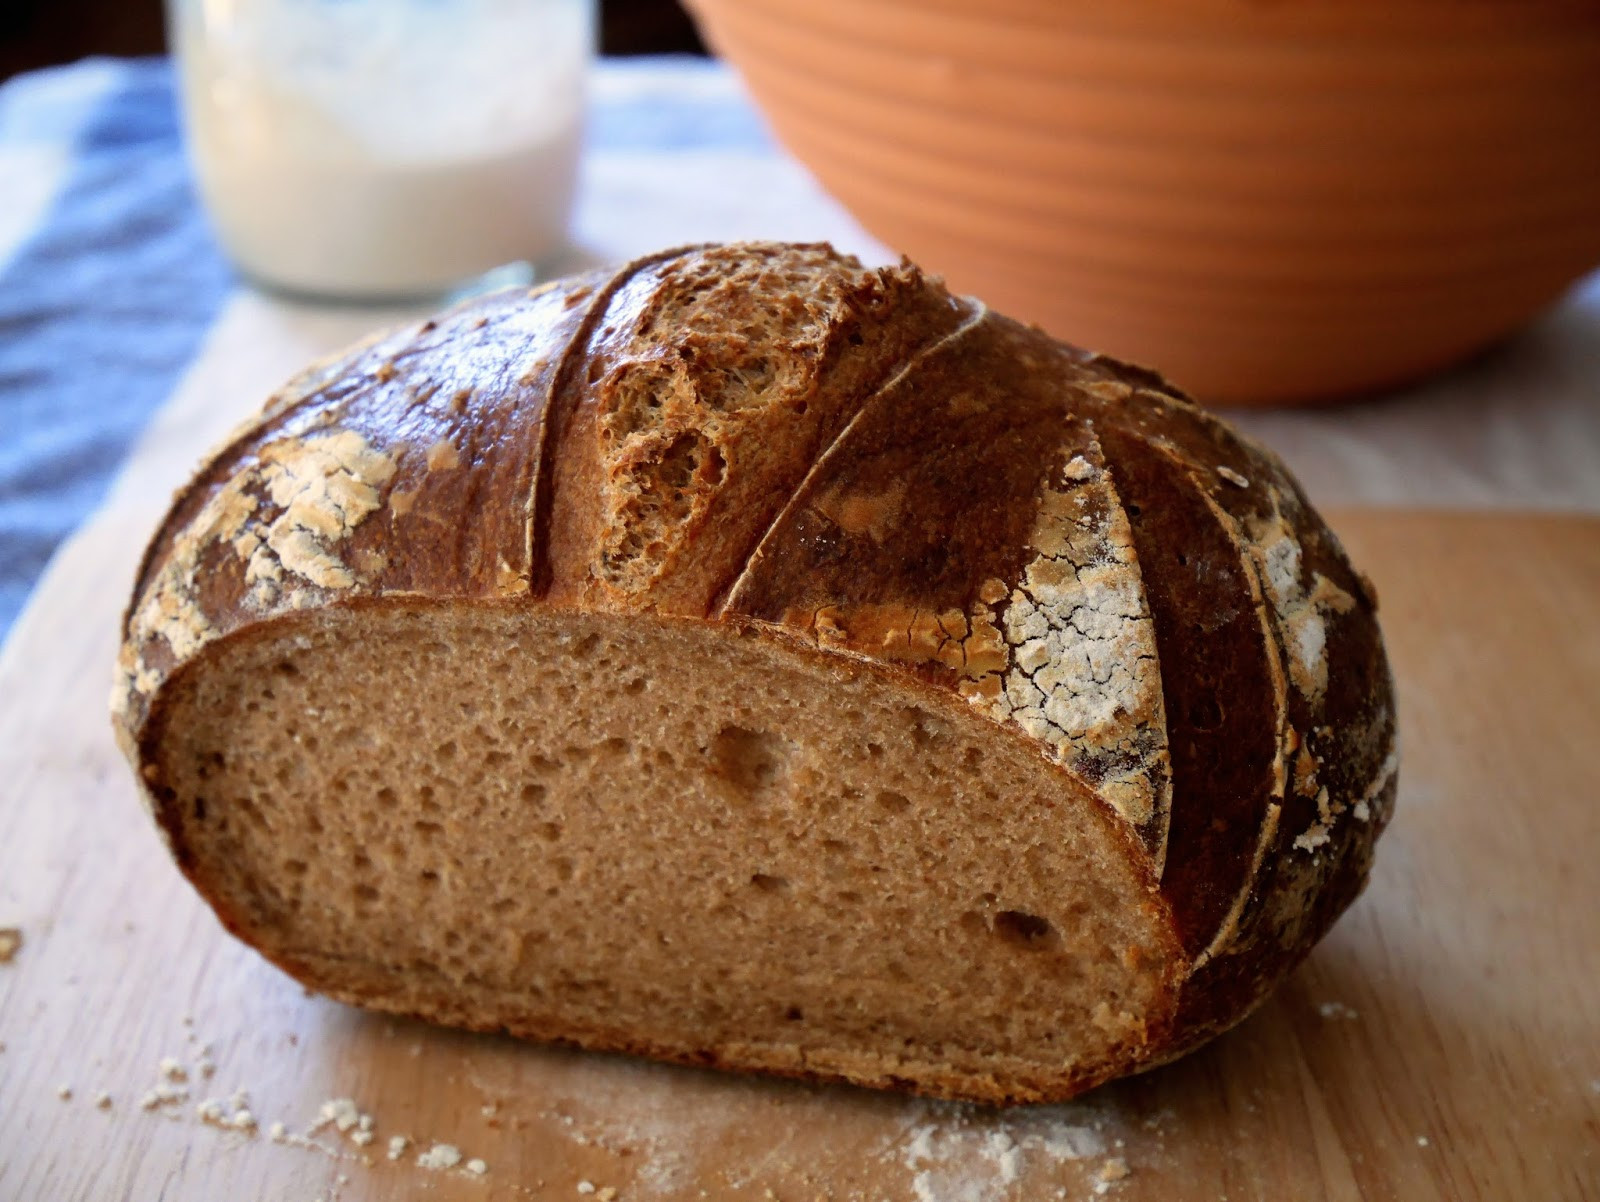 Gluten Free Sourdough Bread  Gluten Free Boulangerie The difference fermentation makes